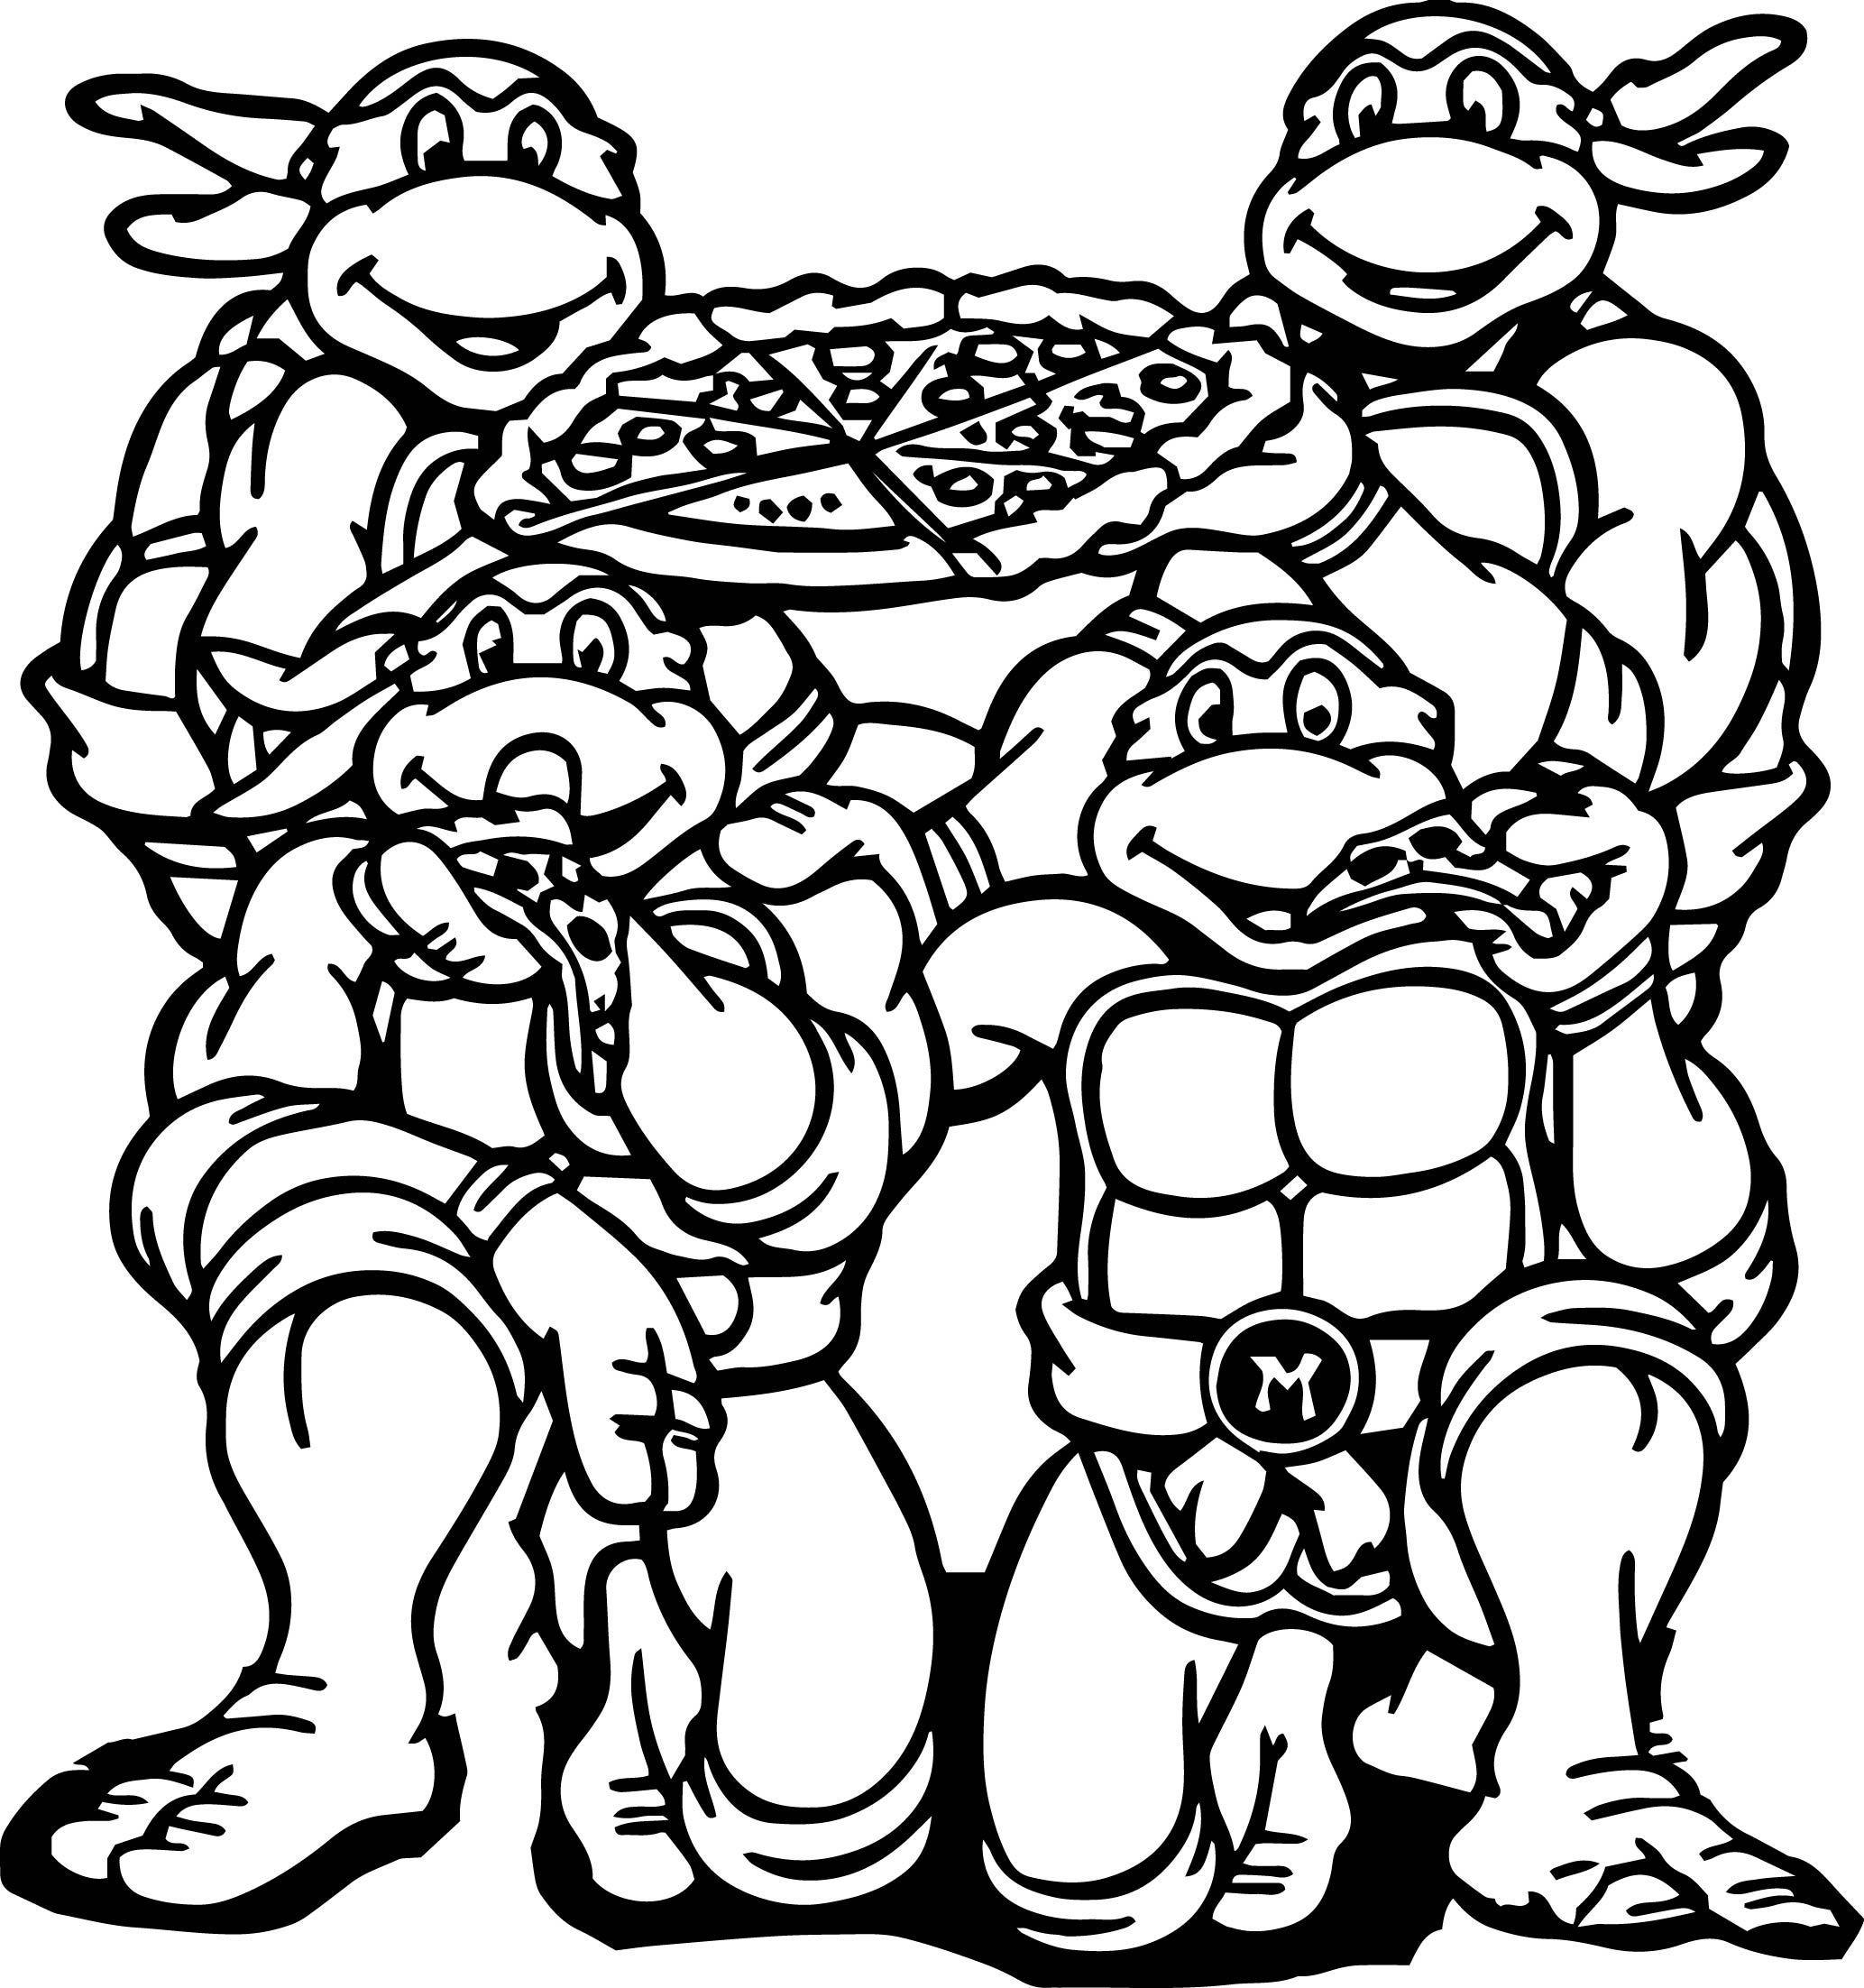 2067x2204 Teenage Mutant Ninja Turtle Coloring Pages Page Turtles Nick